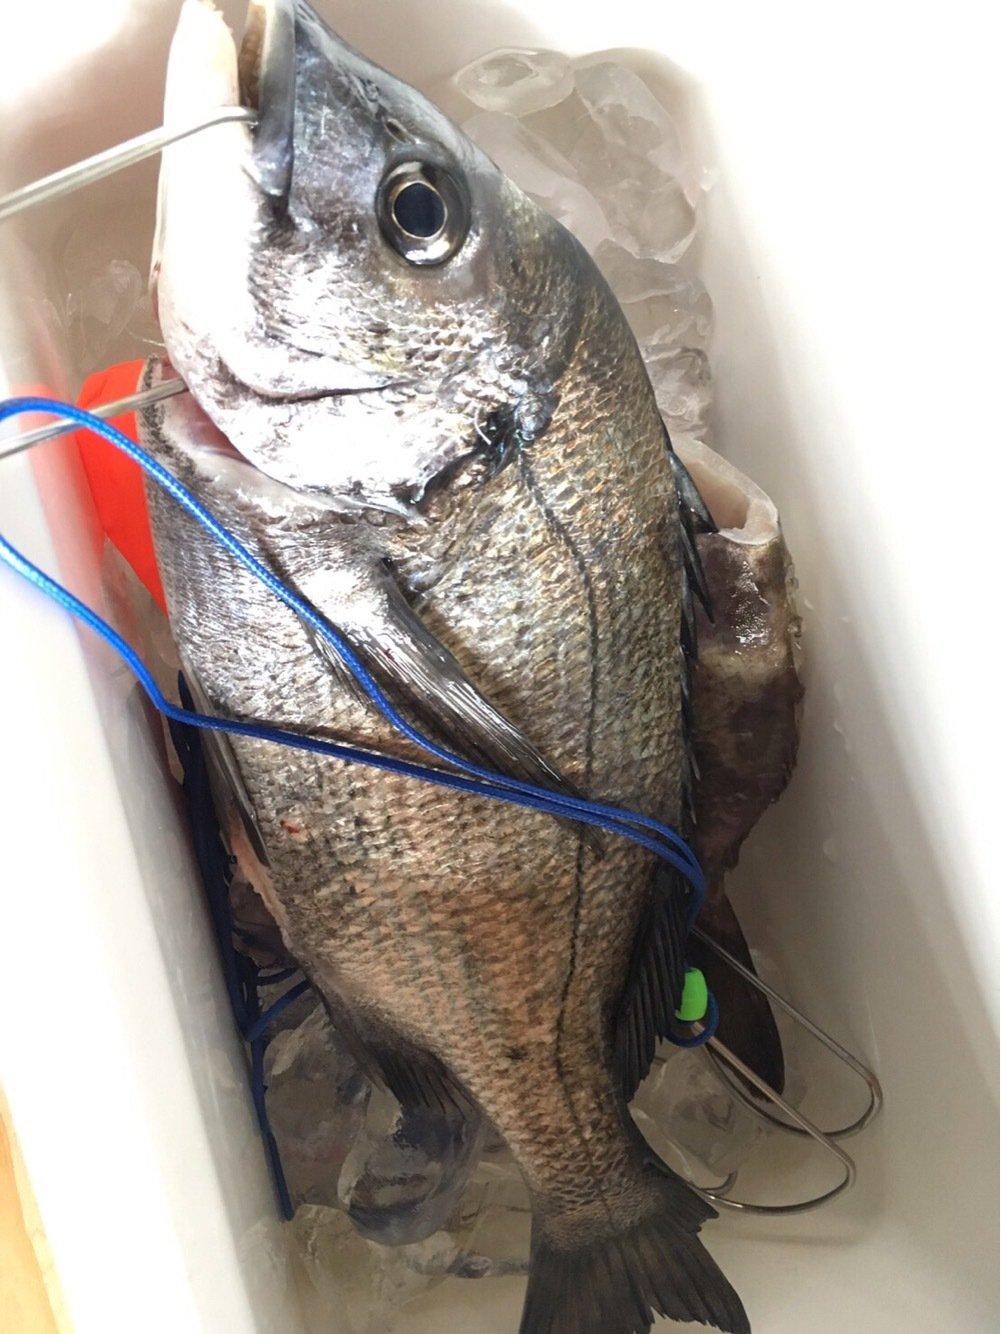 sakaさんの投稿画像,写っている魚はクロダイ